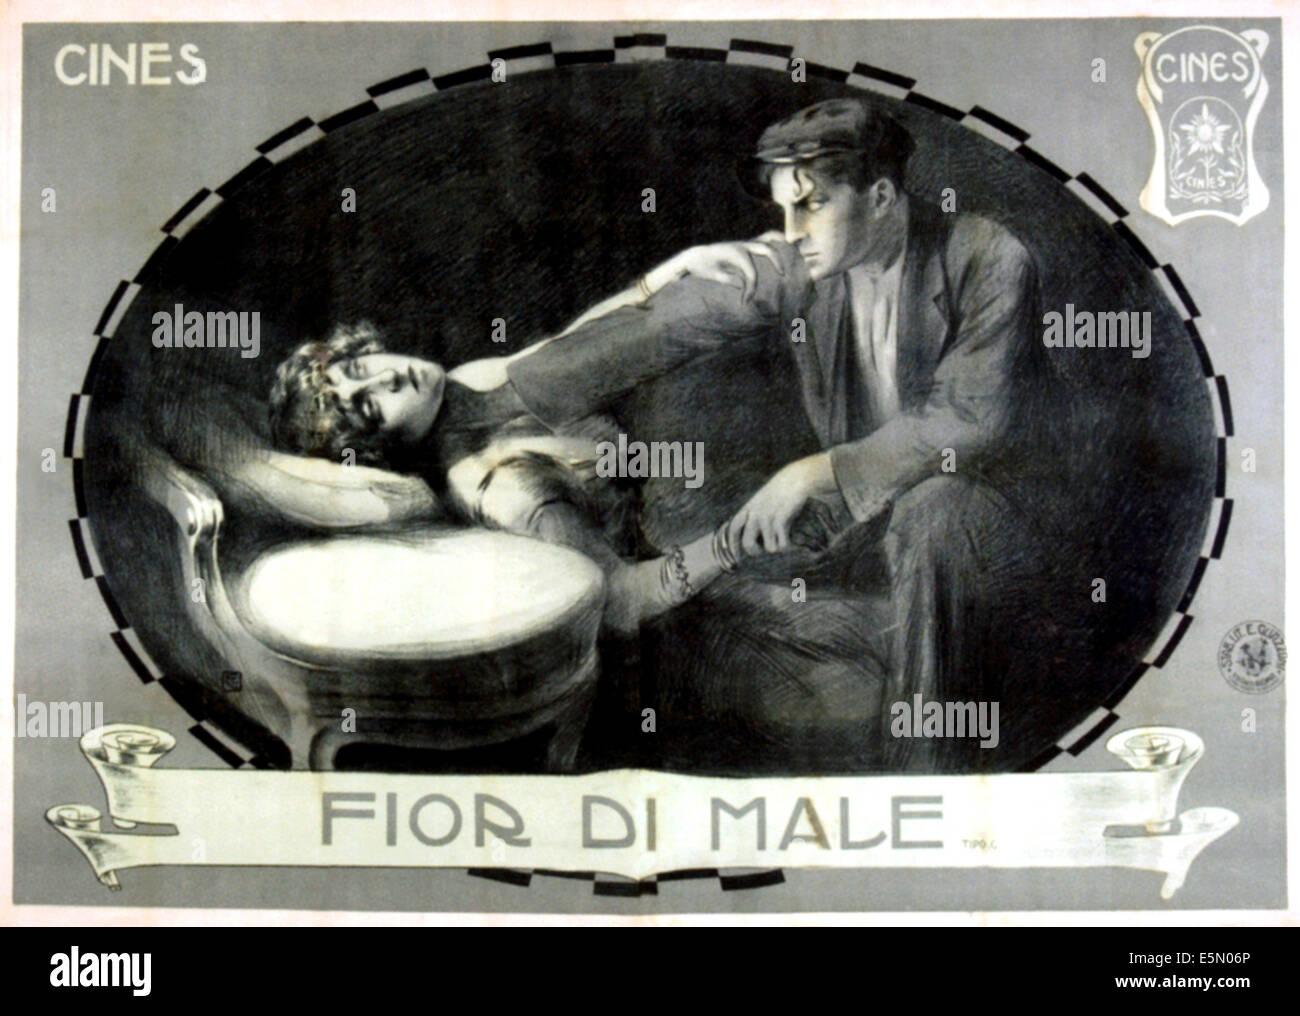 FIOR DI MALE, Italian lobbycard, 1915. - Stock Image